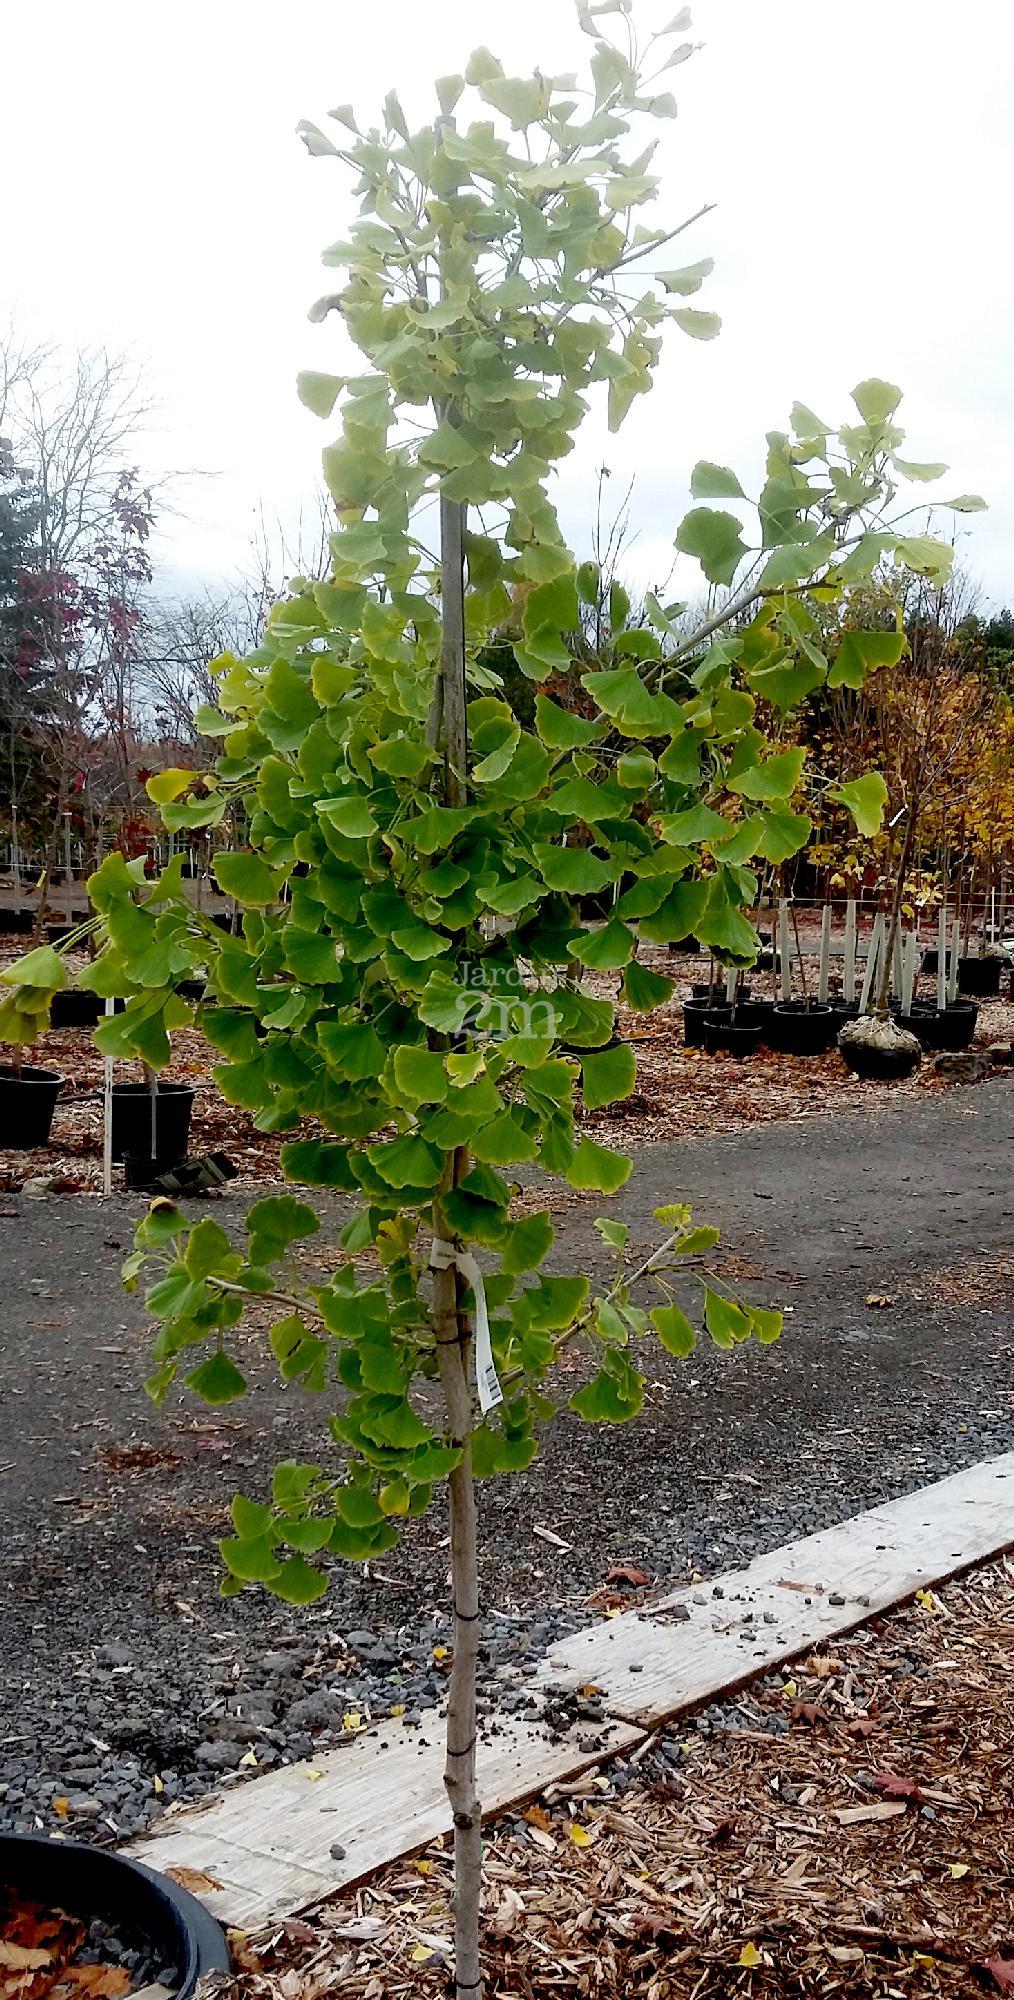 ginkgo biloba magyar arbre aux quarante ecus maidenhair tree nos v g taux jardin2m. Black Bedroom Furniture Sets. Home Design Ideas